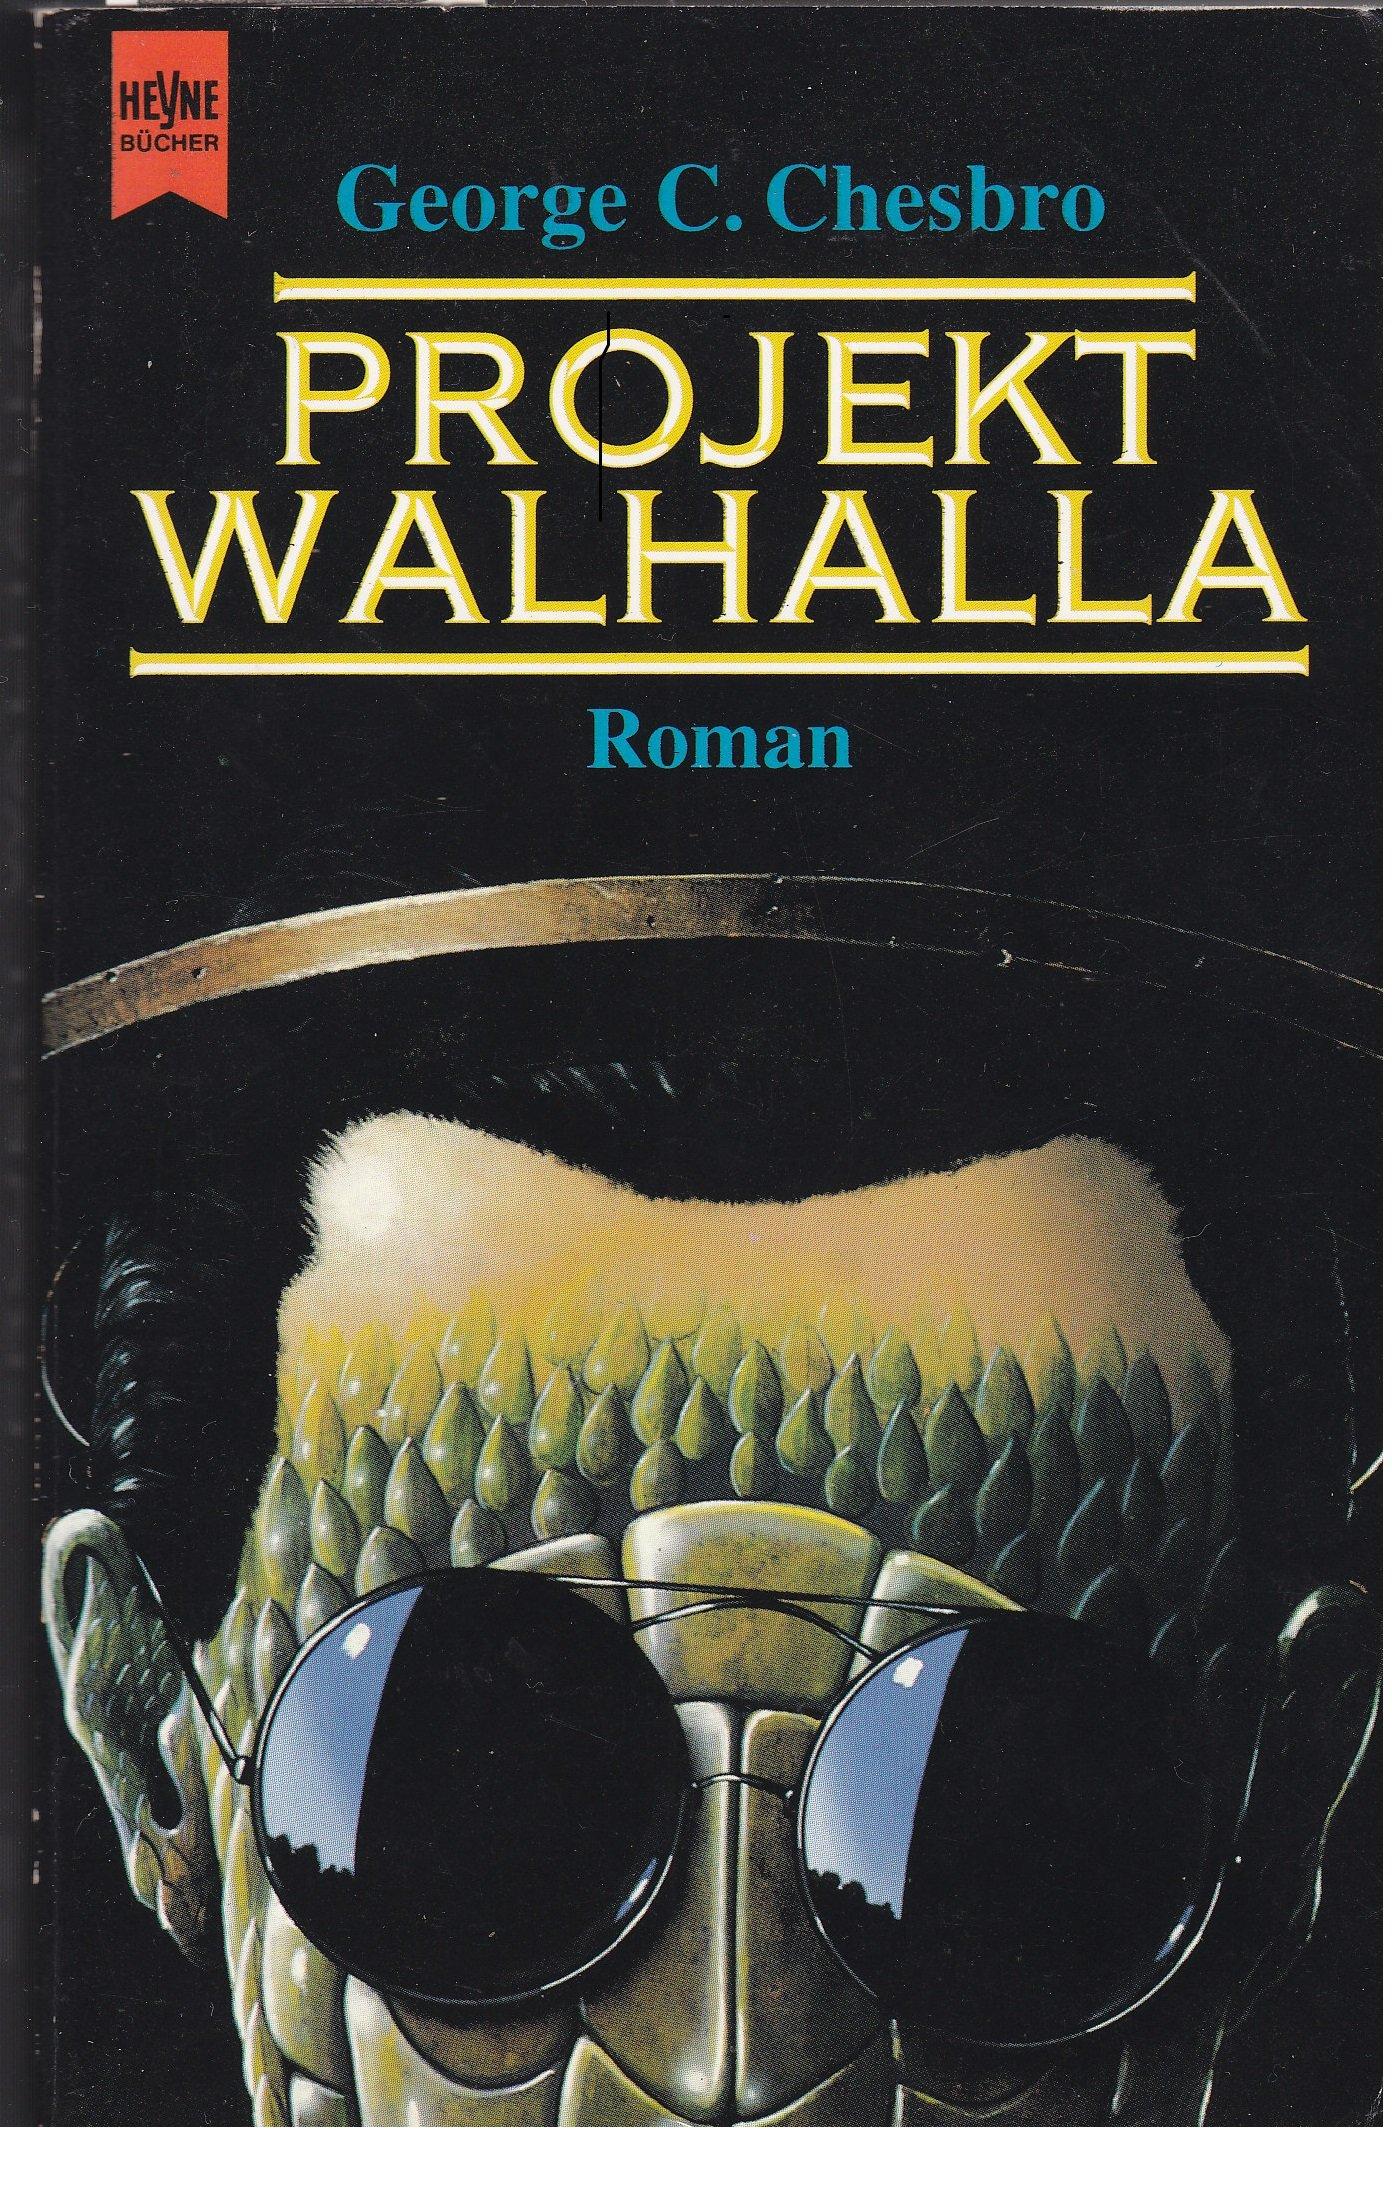 George C. Chesbro - Projekt Walhalla